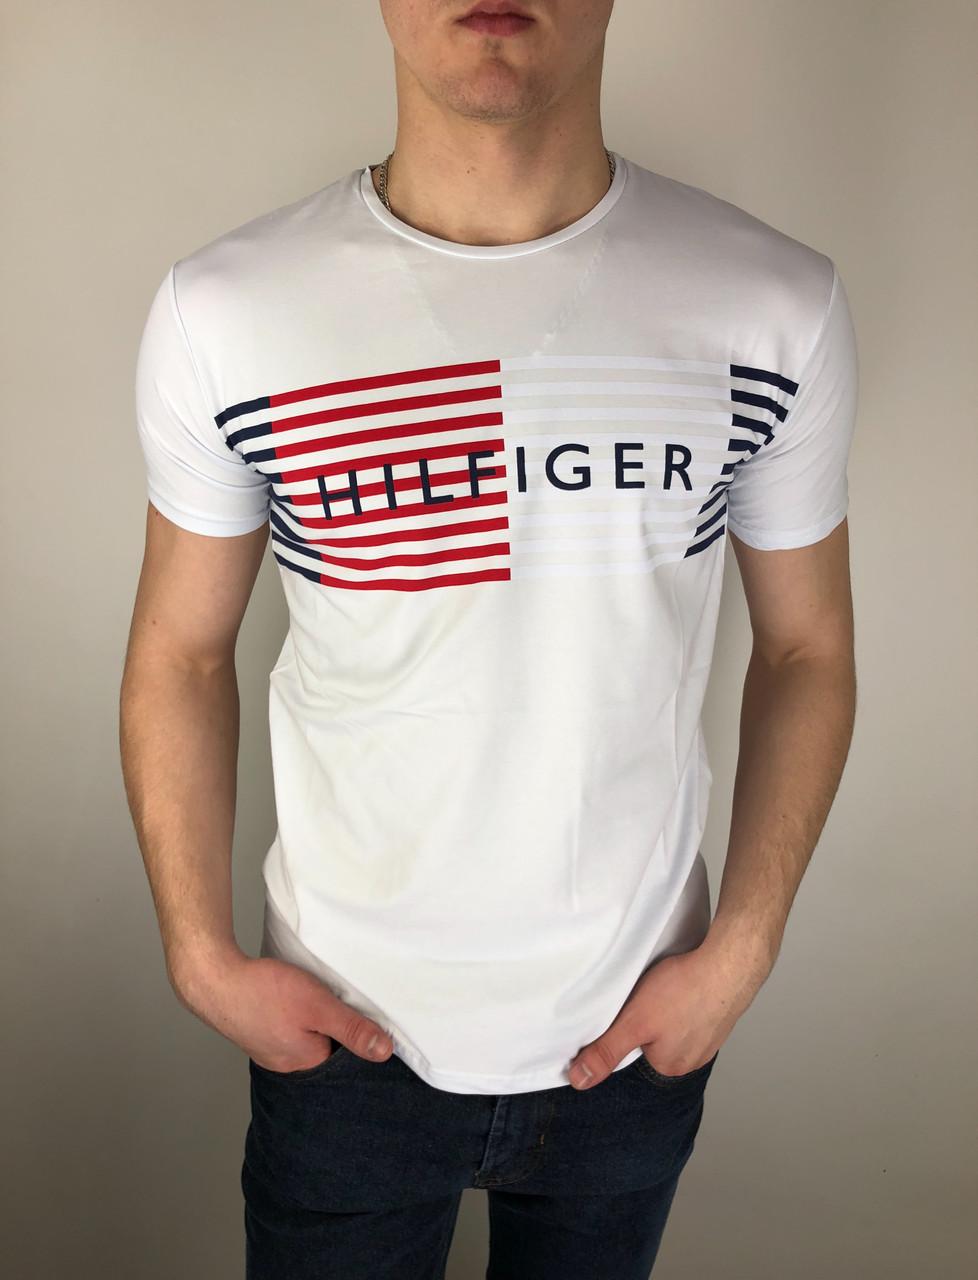 Мужская футболка Tommy Hilfiger качественная копия